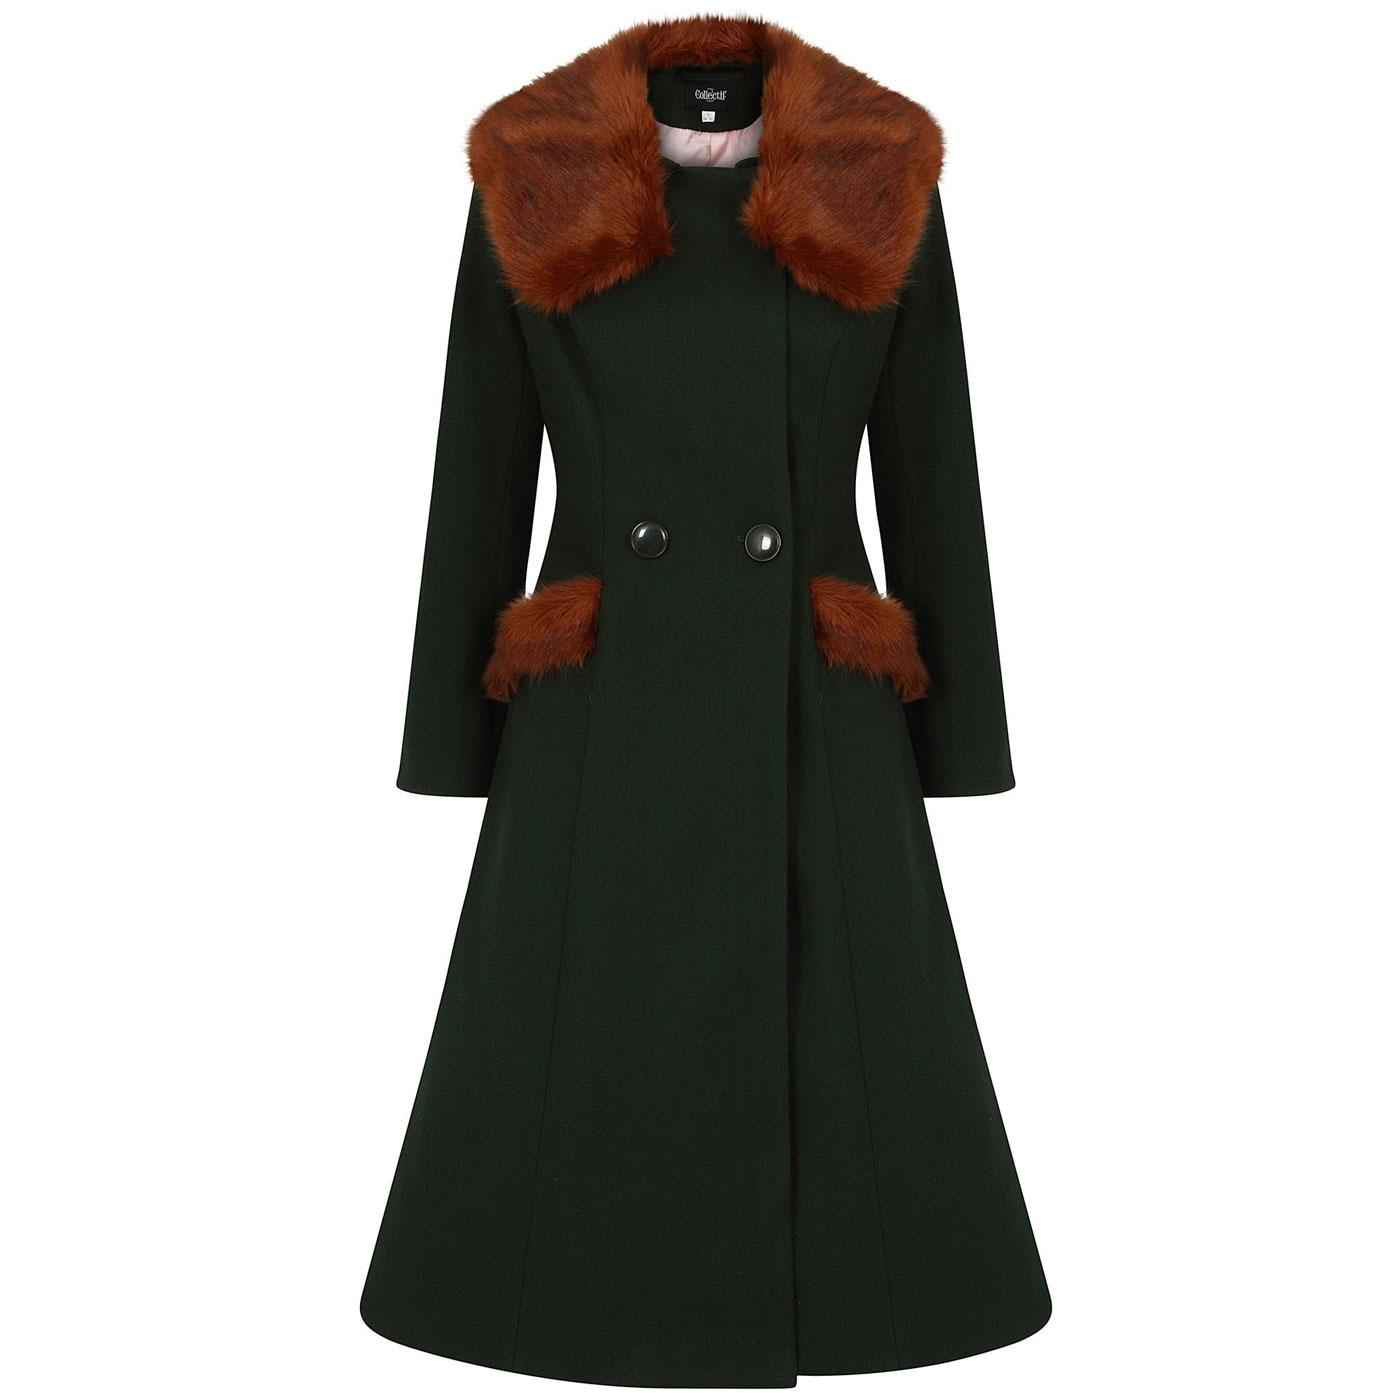 Annasofia COLLECTIF Retro Vintage Winter Coat